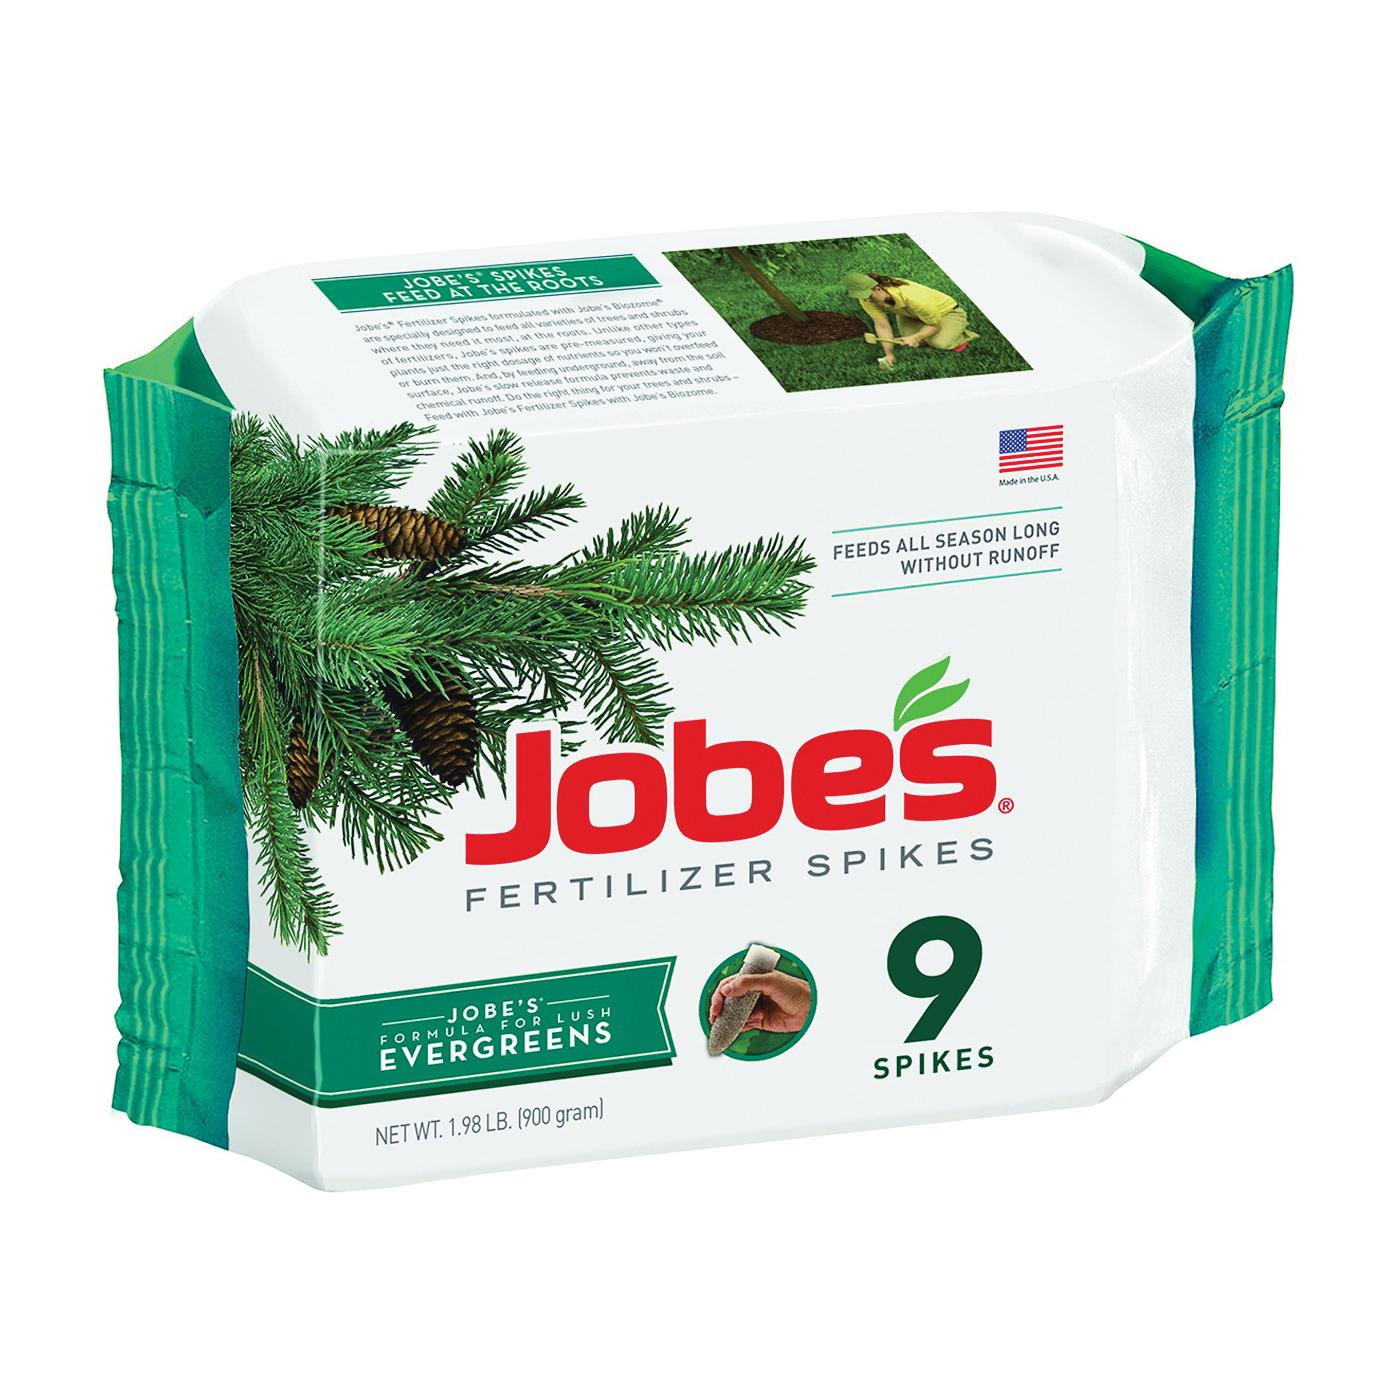 Picture of Jobes 01311 Fertilizer Spike, Spike, Brown, Slight Ammonia